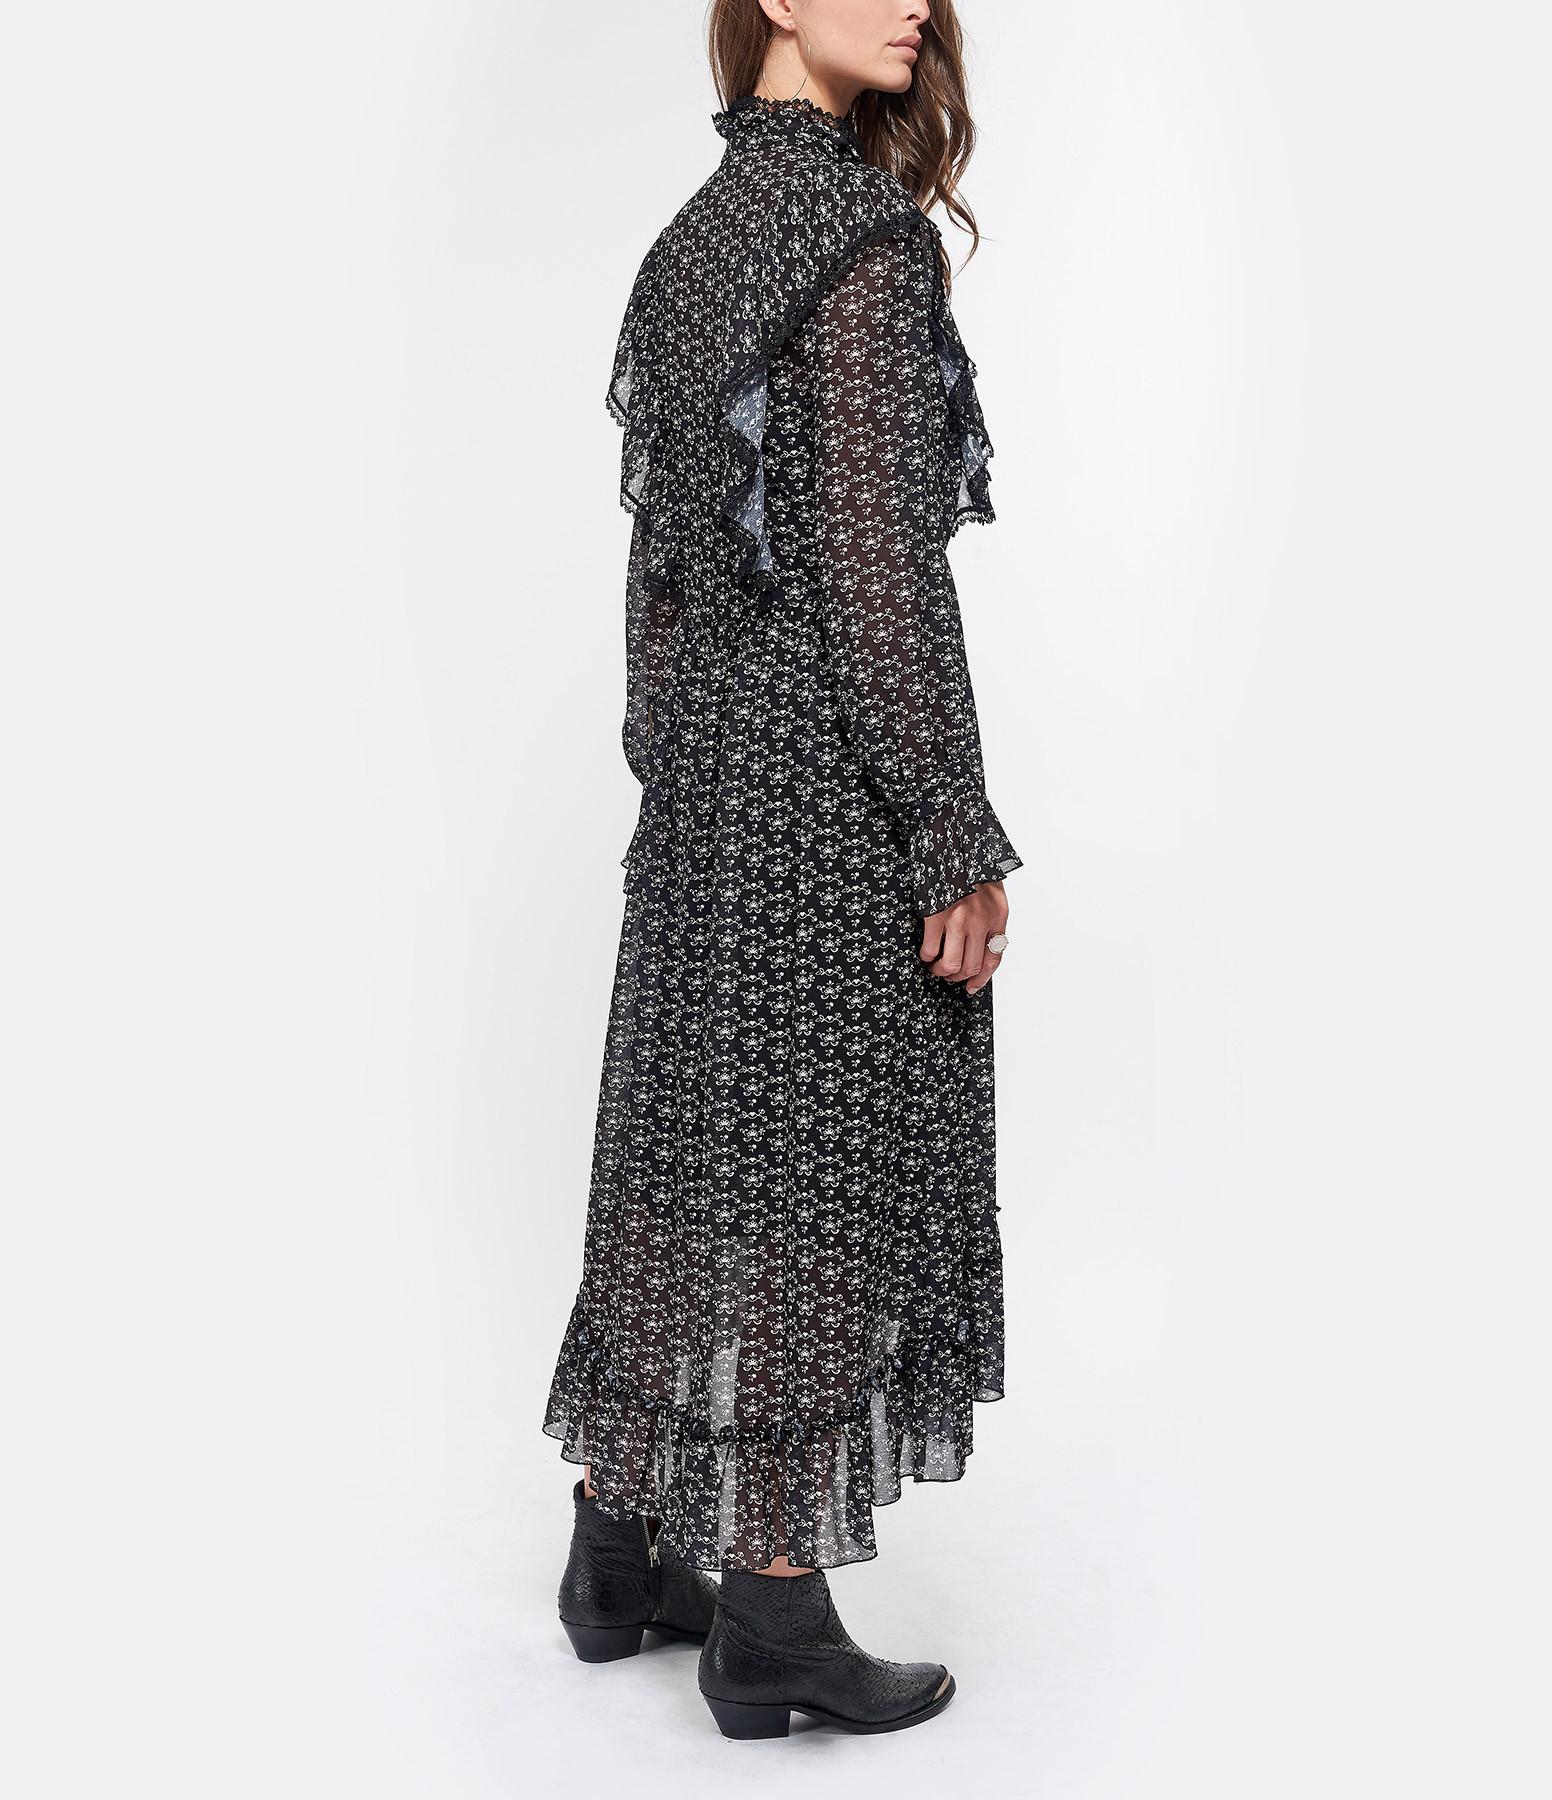 SEE BY CHLOE - Robe Volant Transparente Noir Blanc